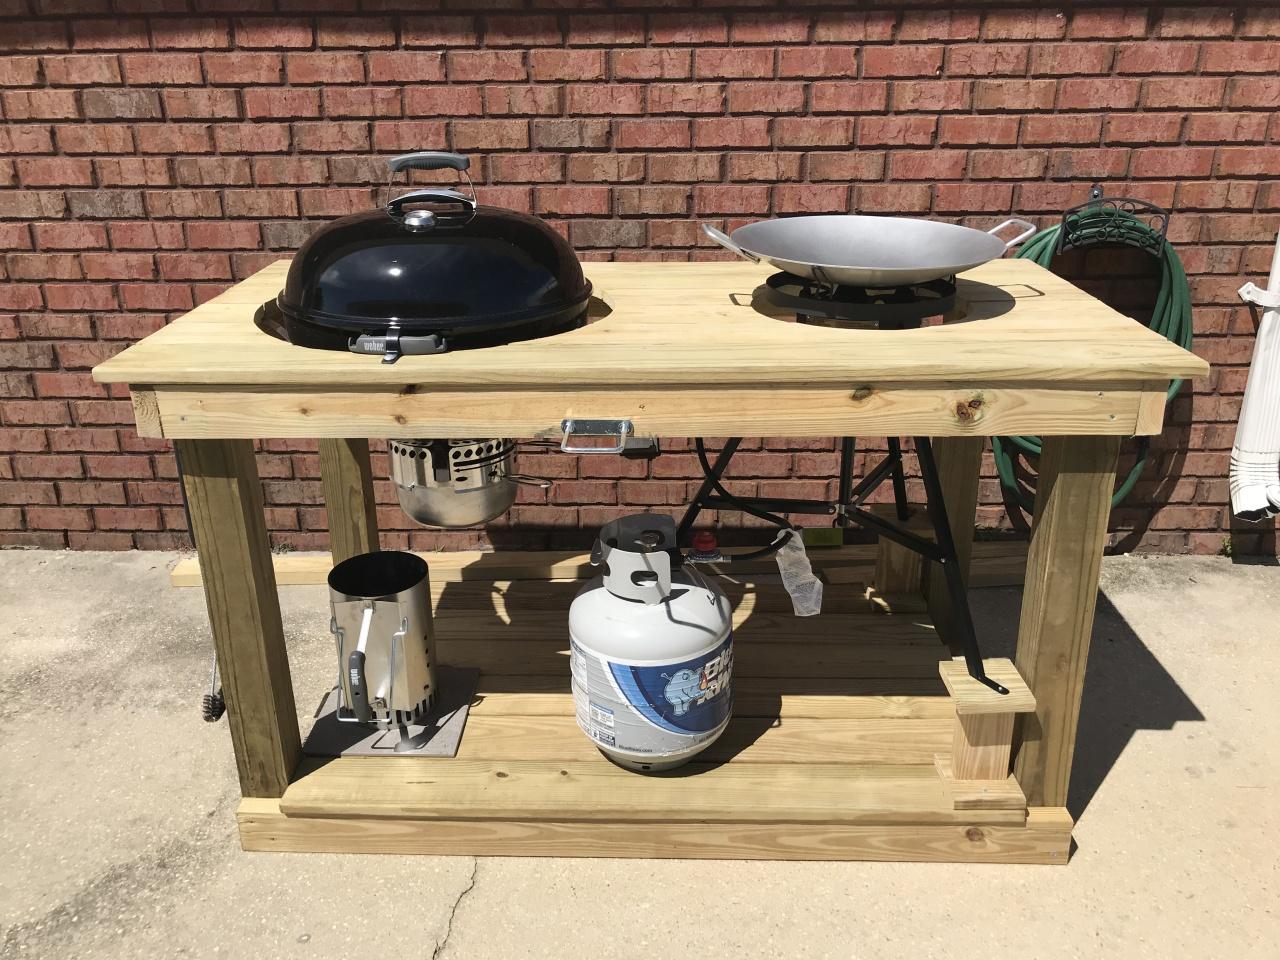 Redneck outdoor kitchen-2947e354-68f6-462a-804a-edda39ba00af-jpg